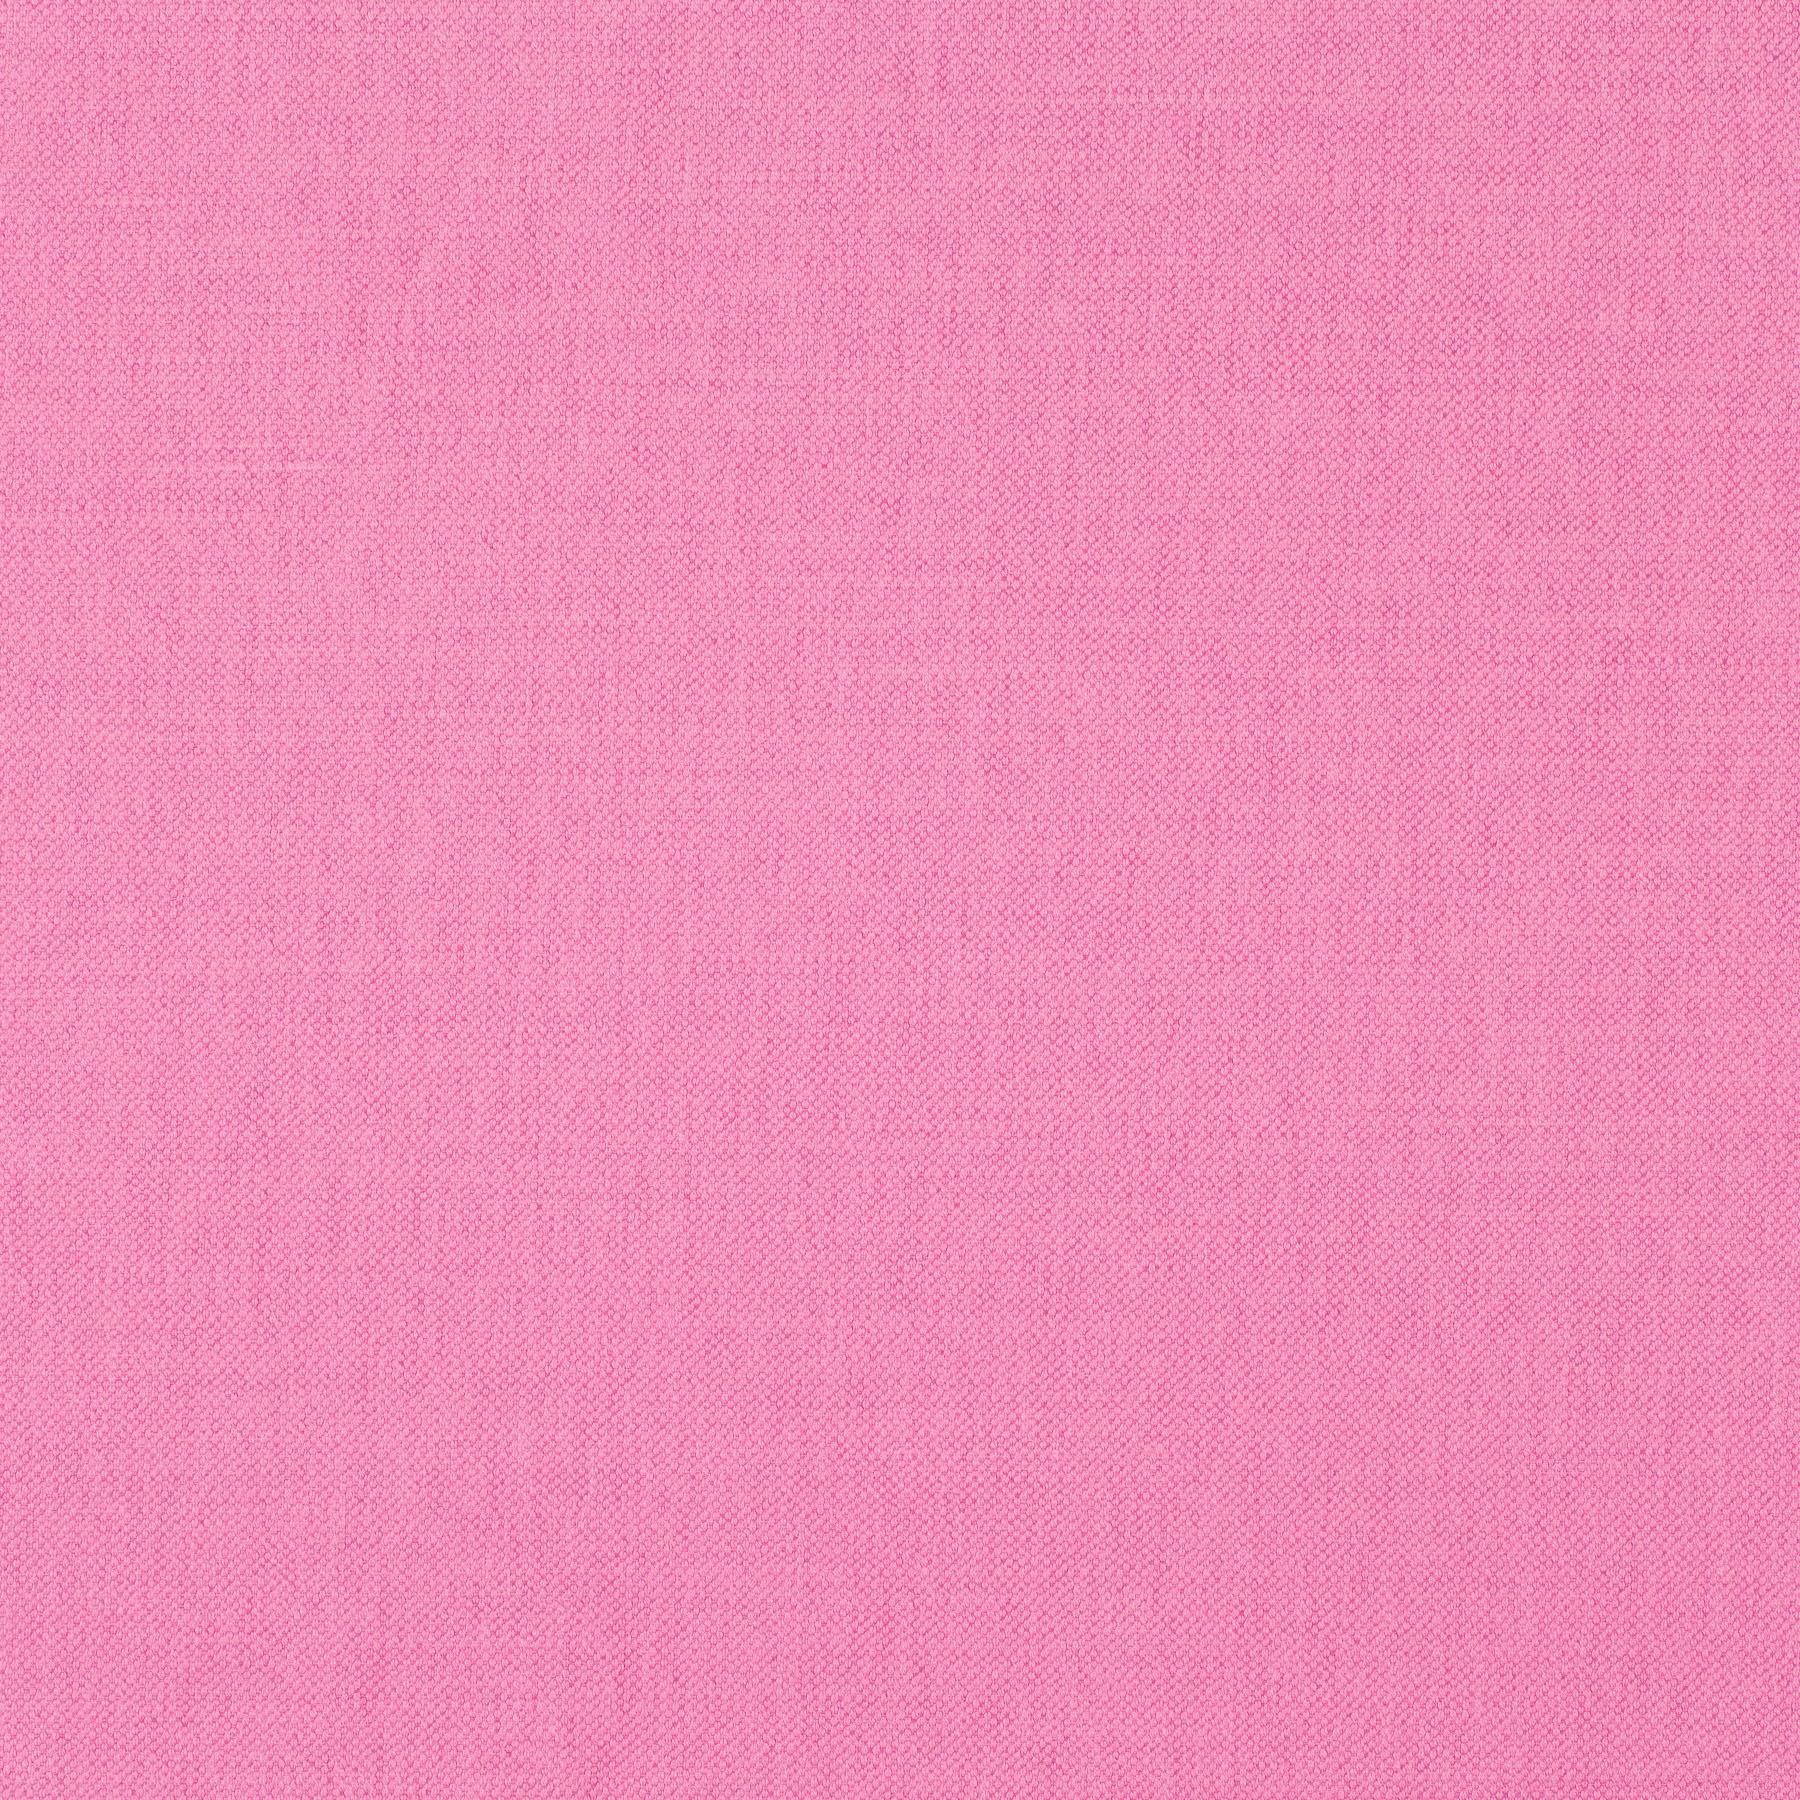 rosa hot madison CH1249/064-0